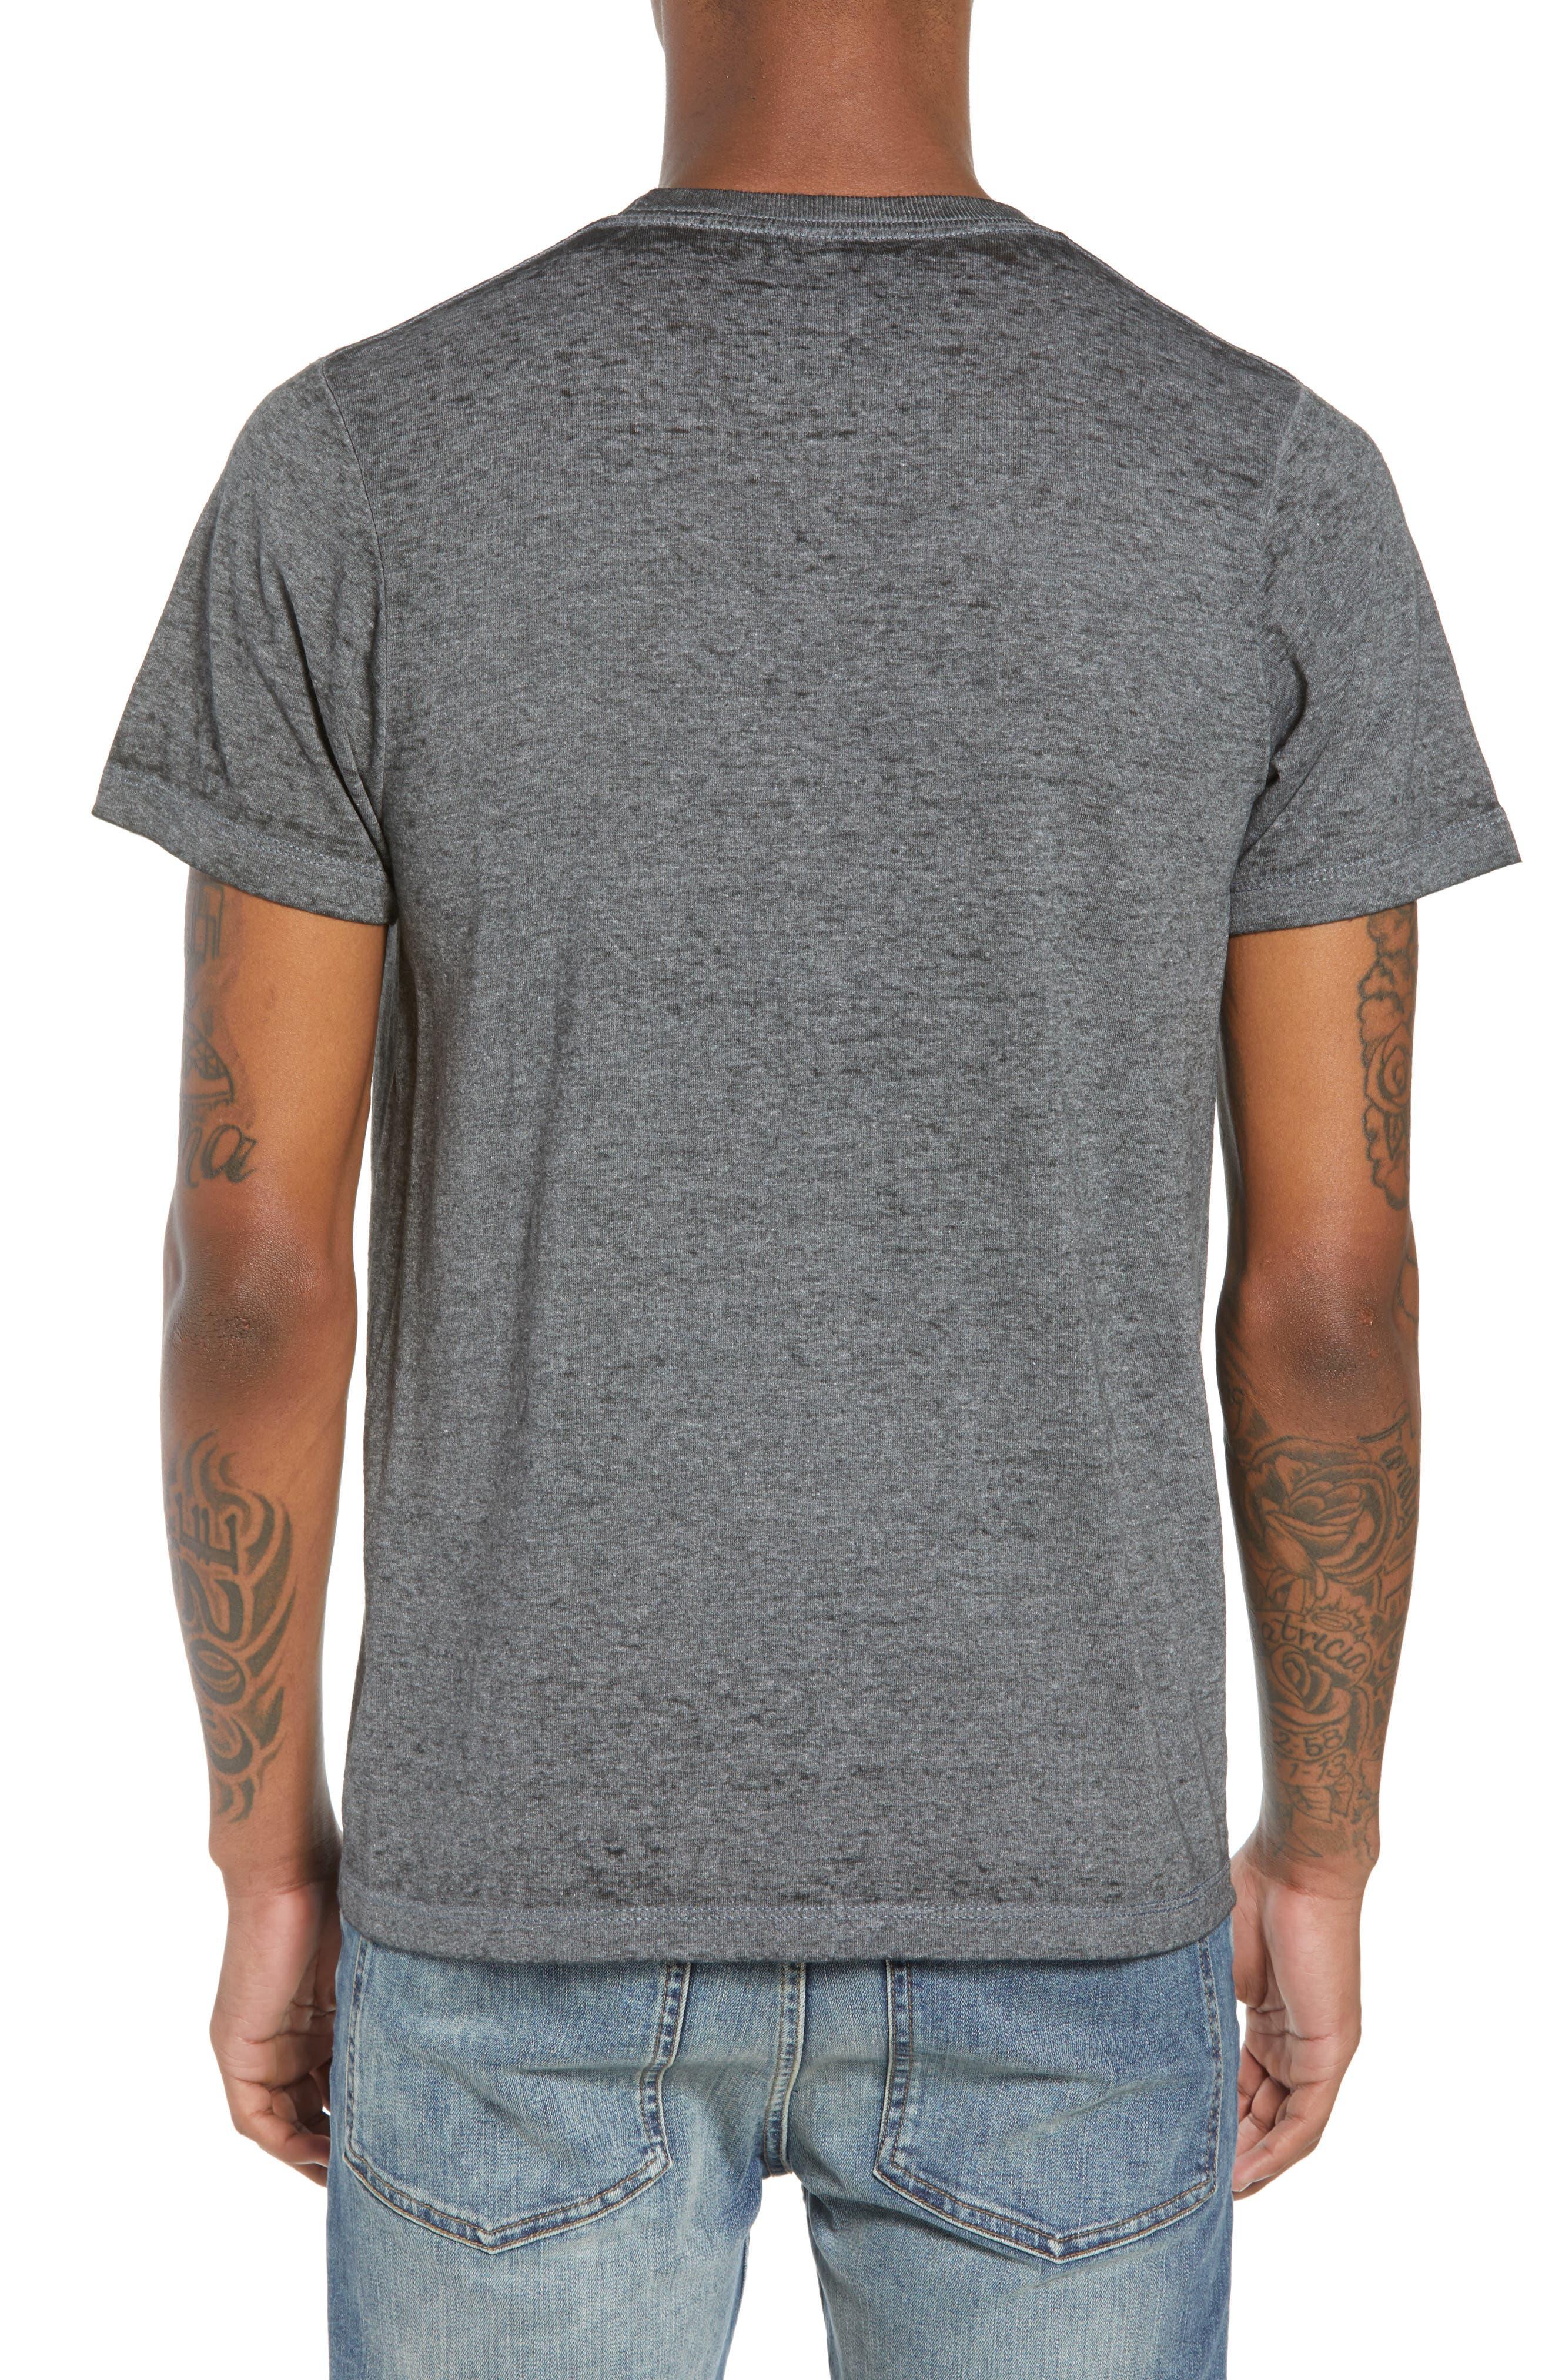 CBGB T-Shirt,                             Alternate thumbnail 2, color,                             Grey Cbgb Burnout